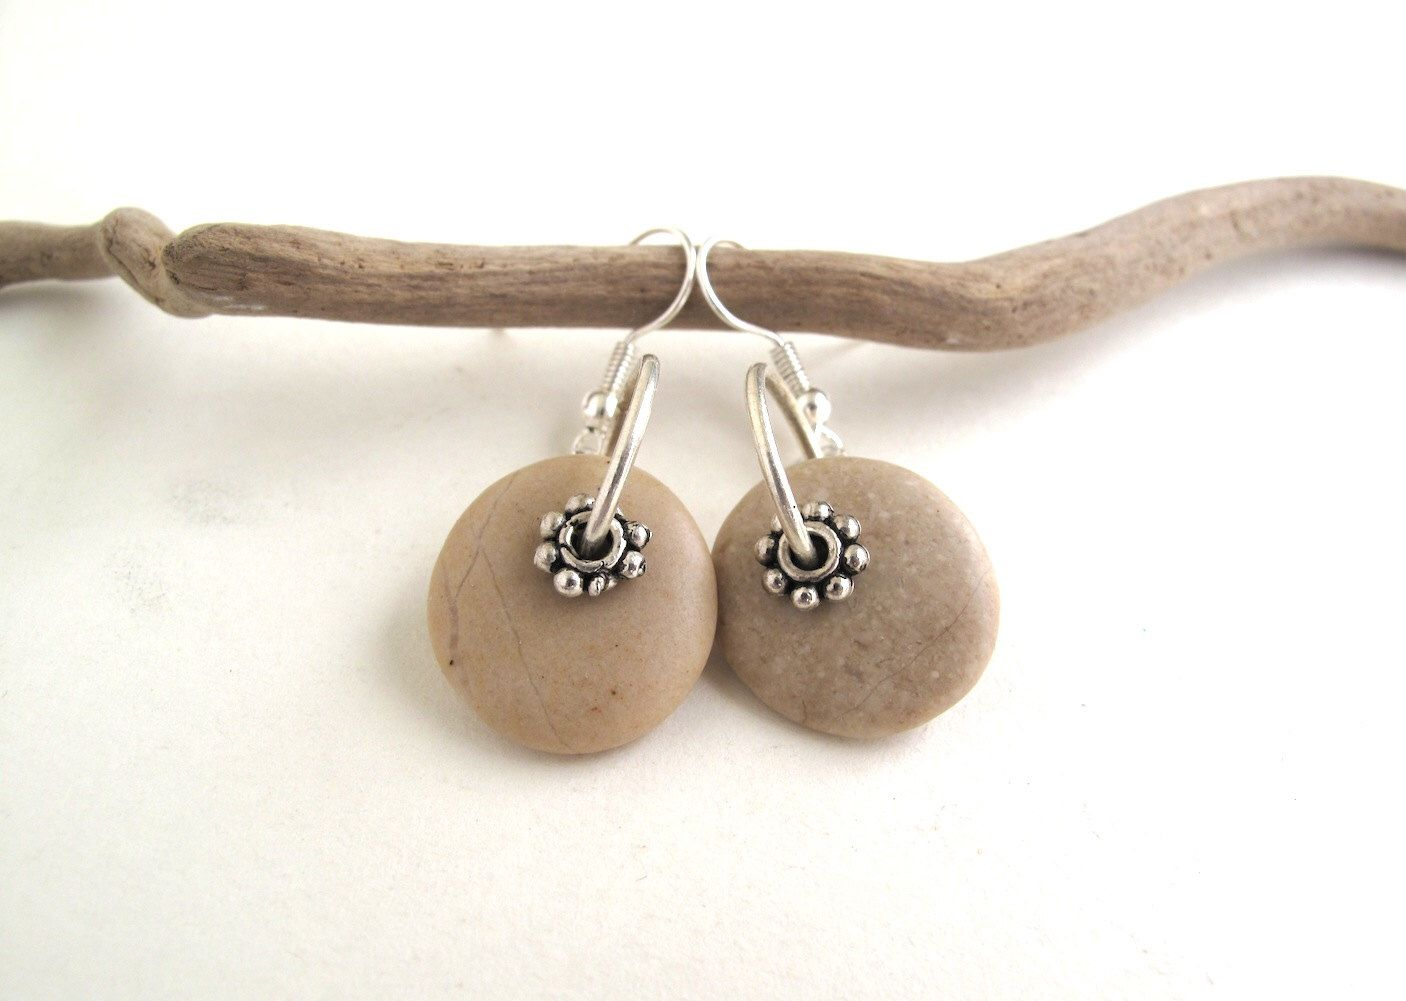 Beach Stone Earrings Handmade Mediterranean Natural Rock Jewelry ...